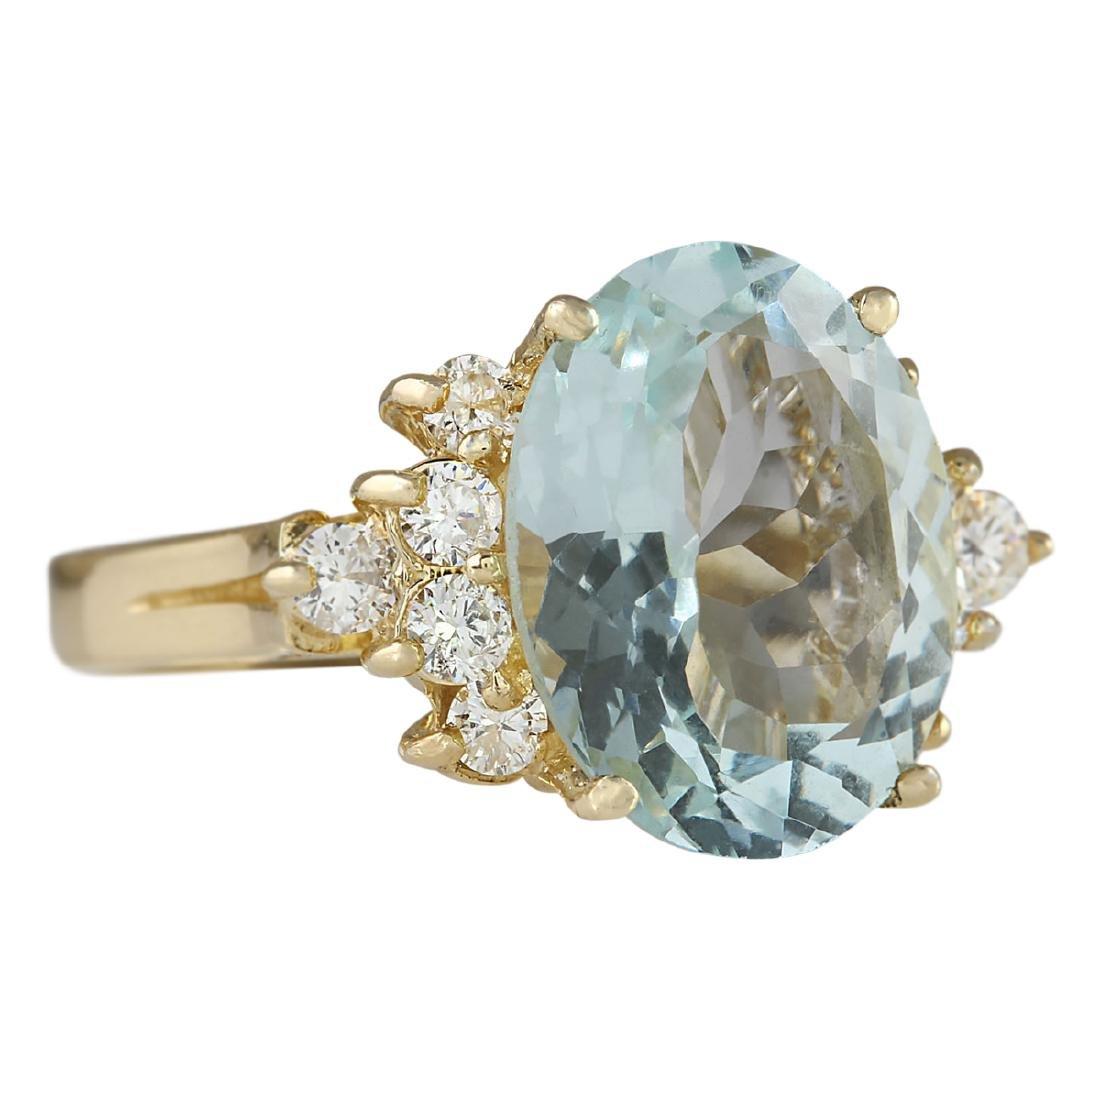 4.75 CTW Natural Aquamarine And Diamond Ring In 18K - 2